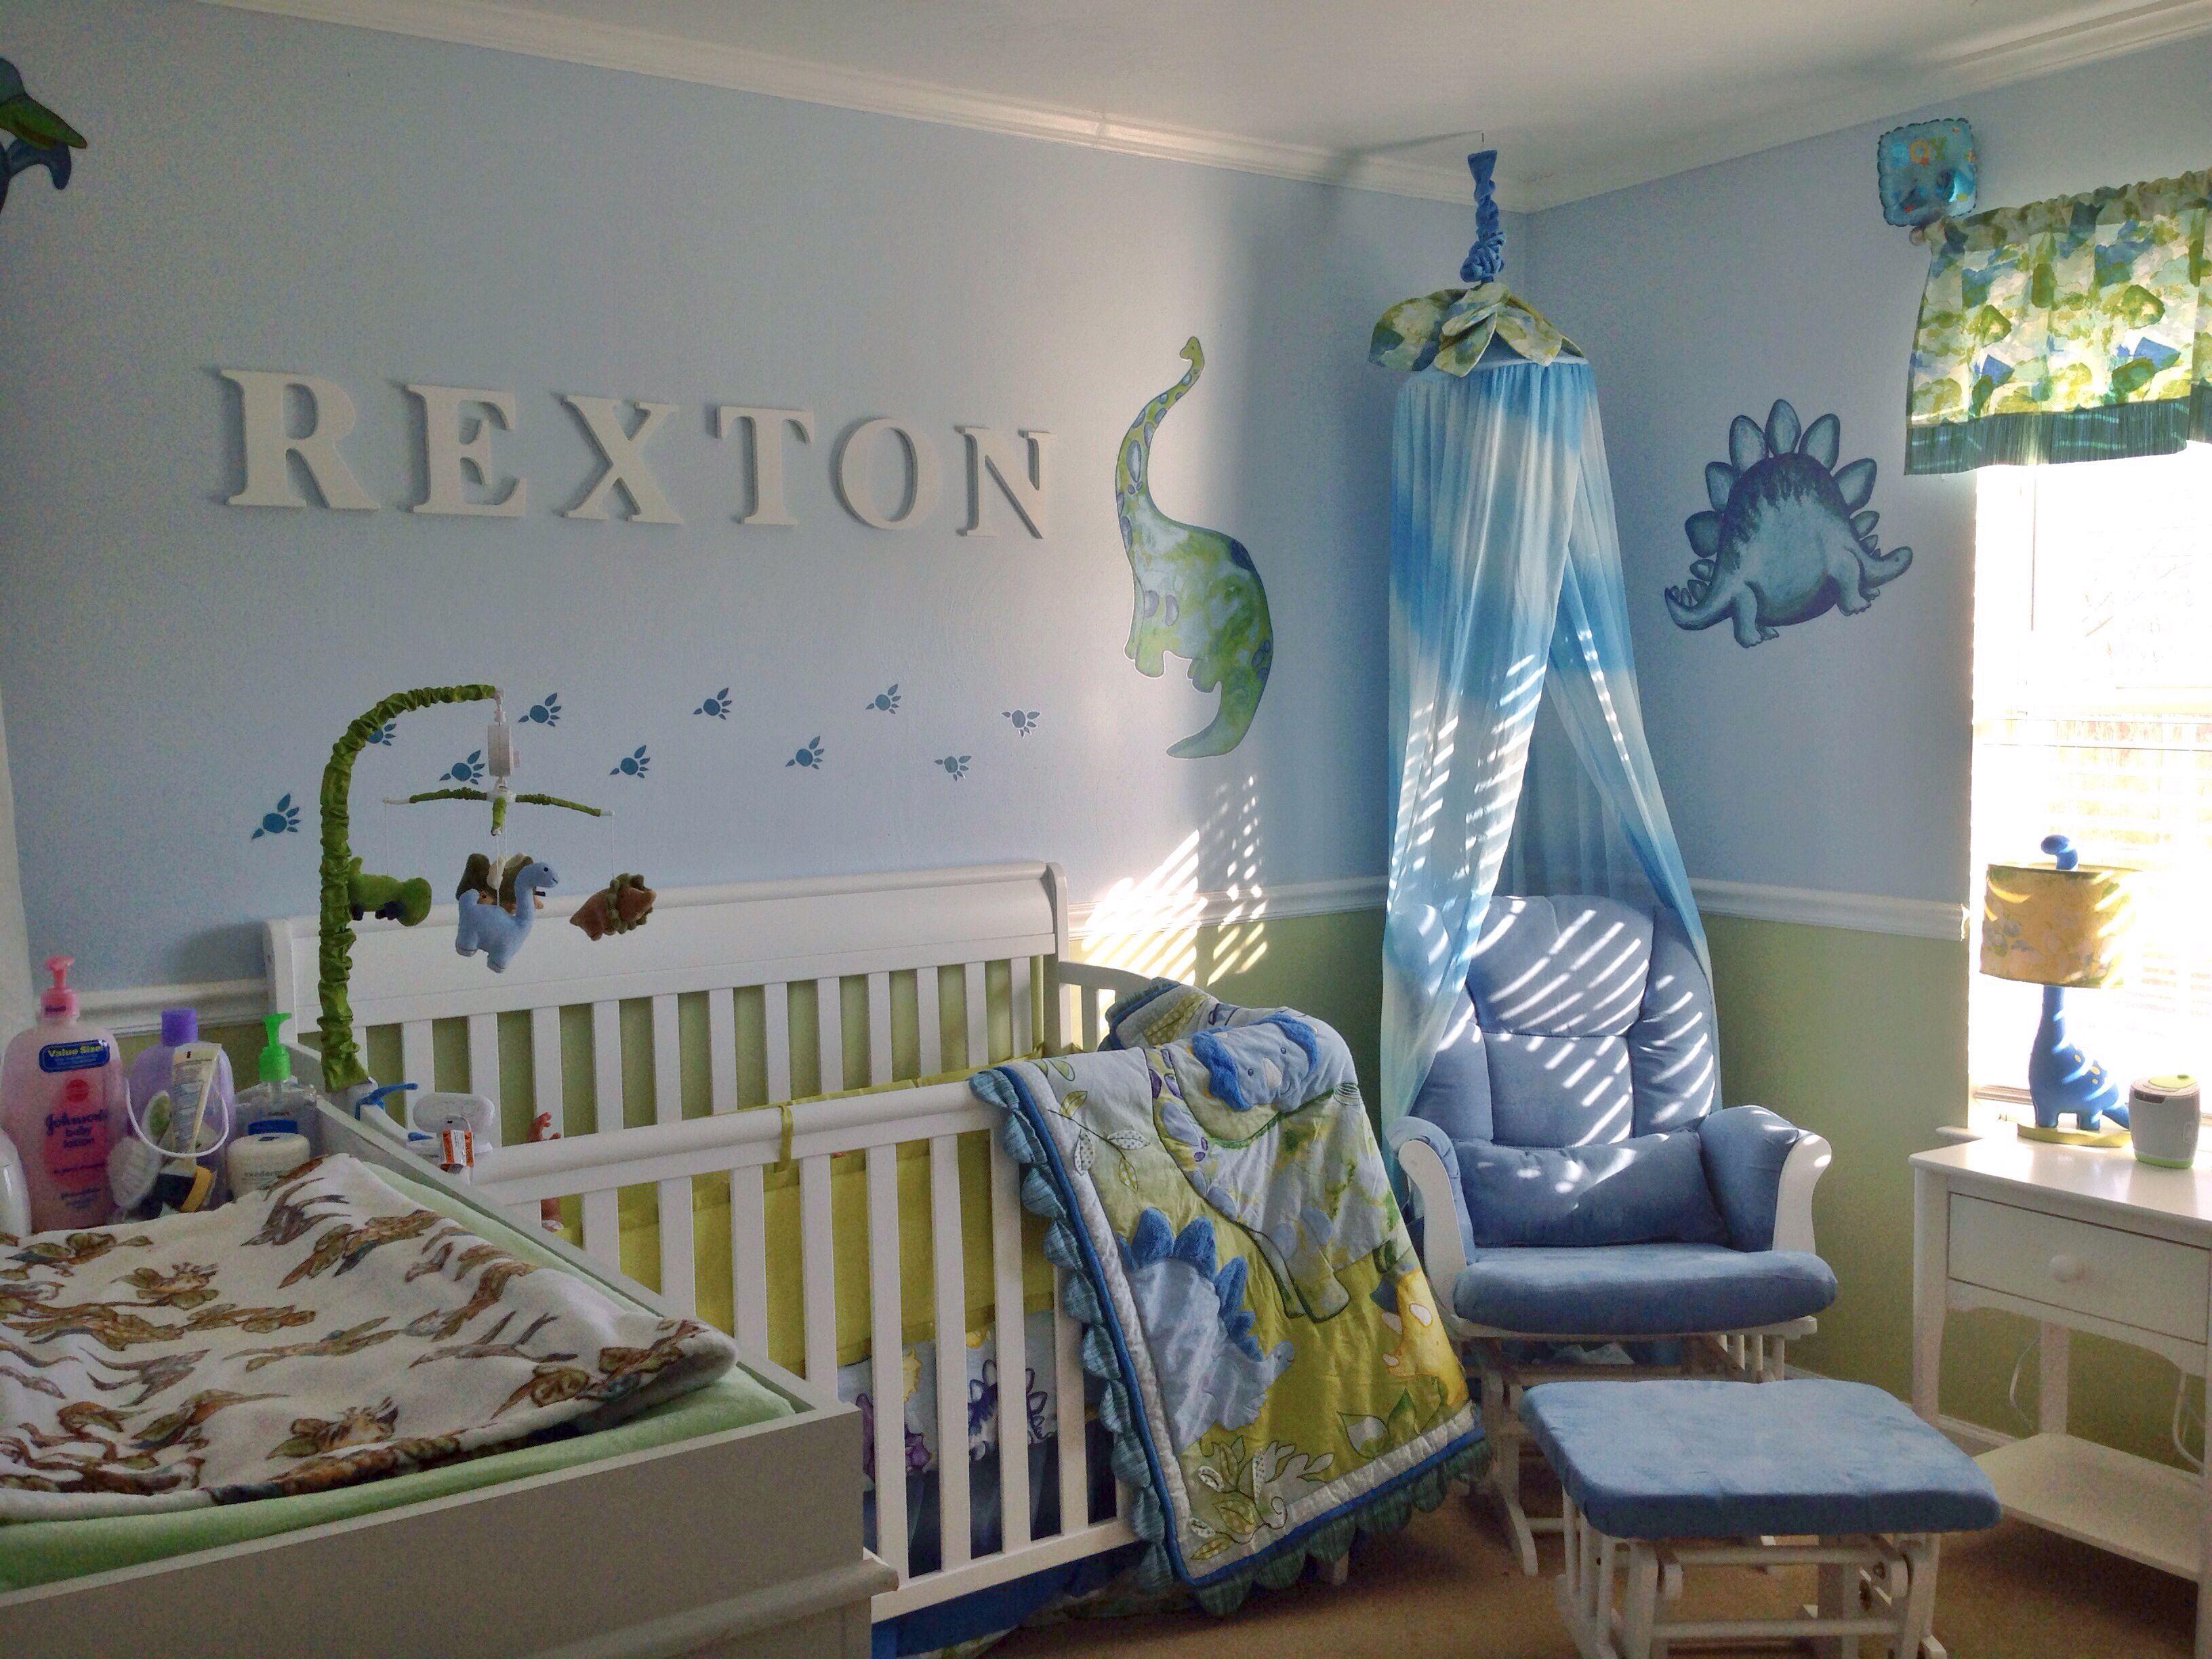 Rexton s nursery = Heidi Klum s Truly Scrumptious Dinosaur theme